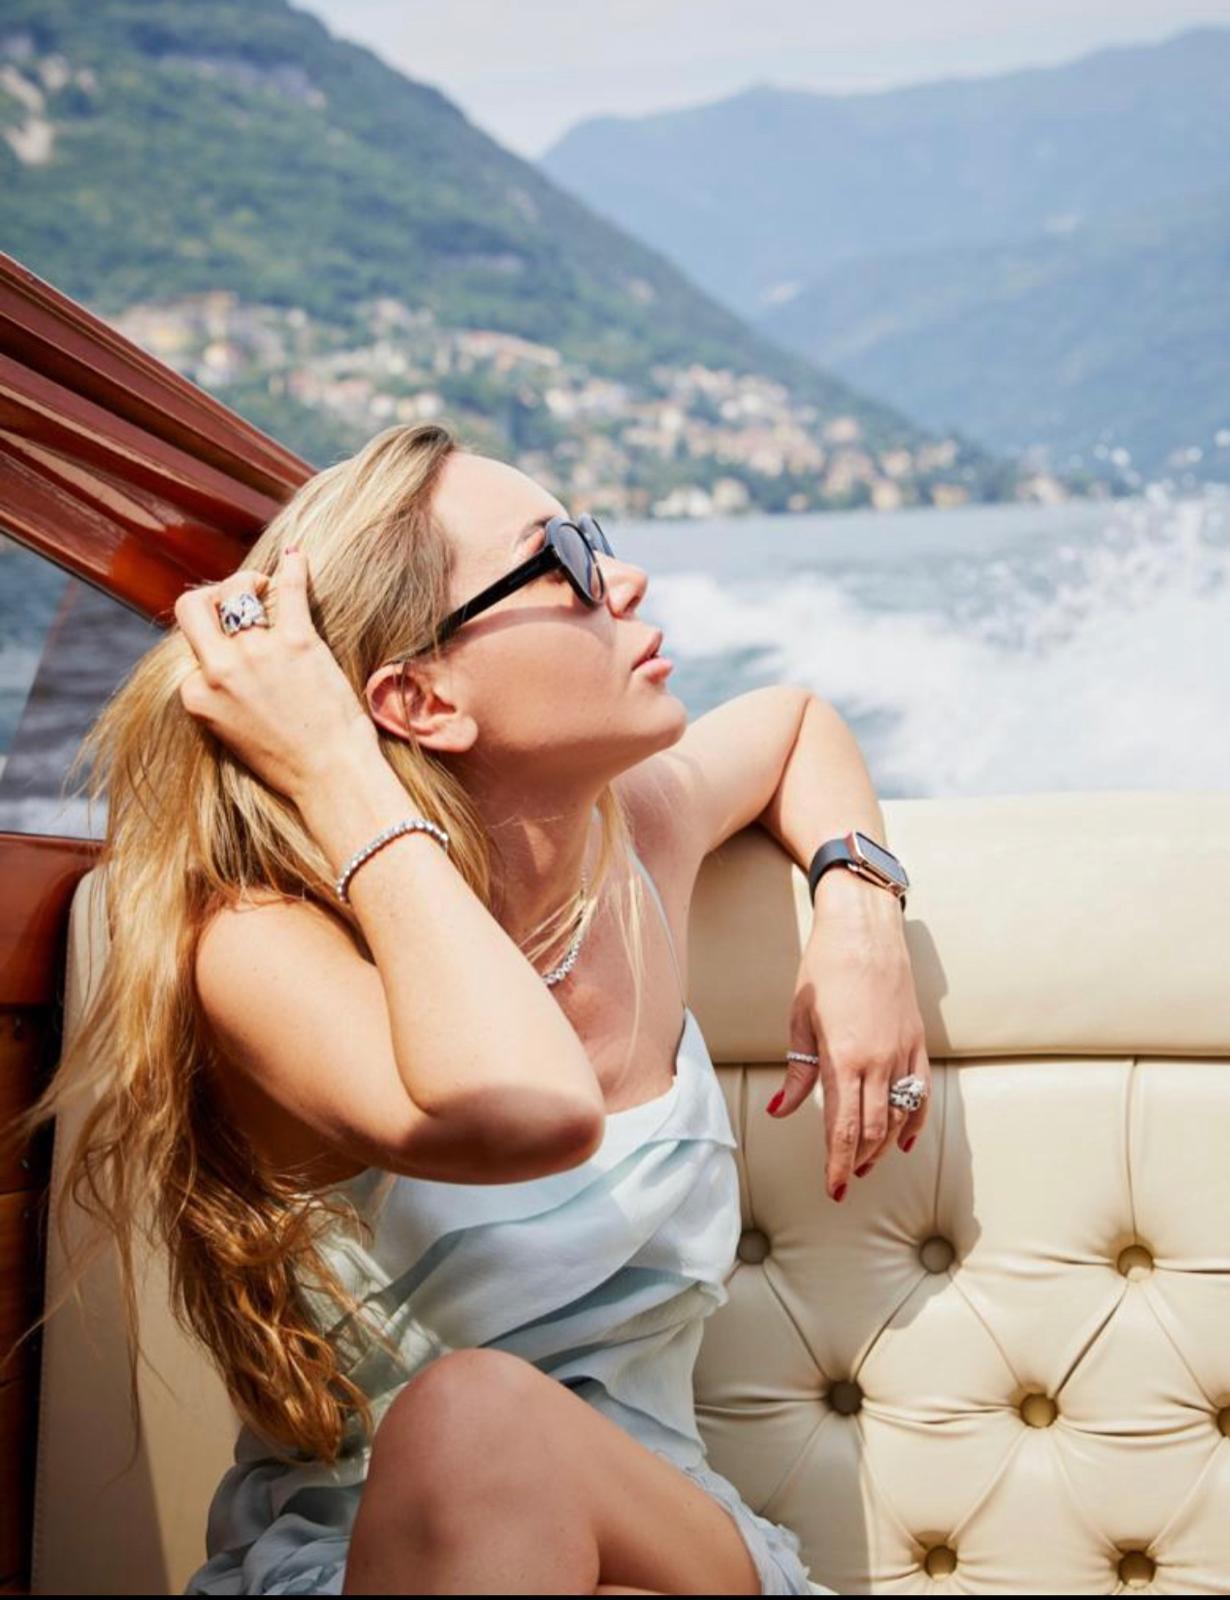 Cartier Symbolic Rebirth at Lake Como, Italy